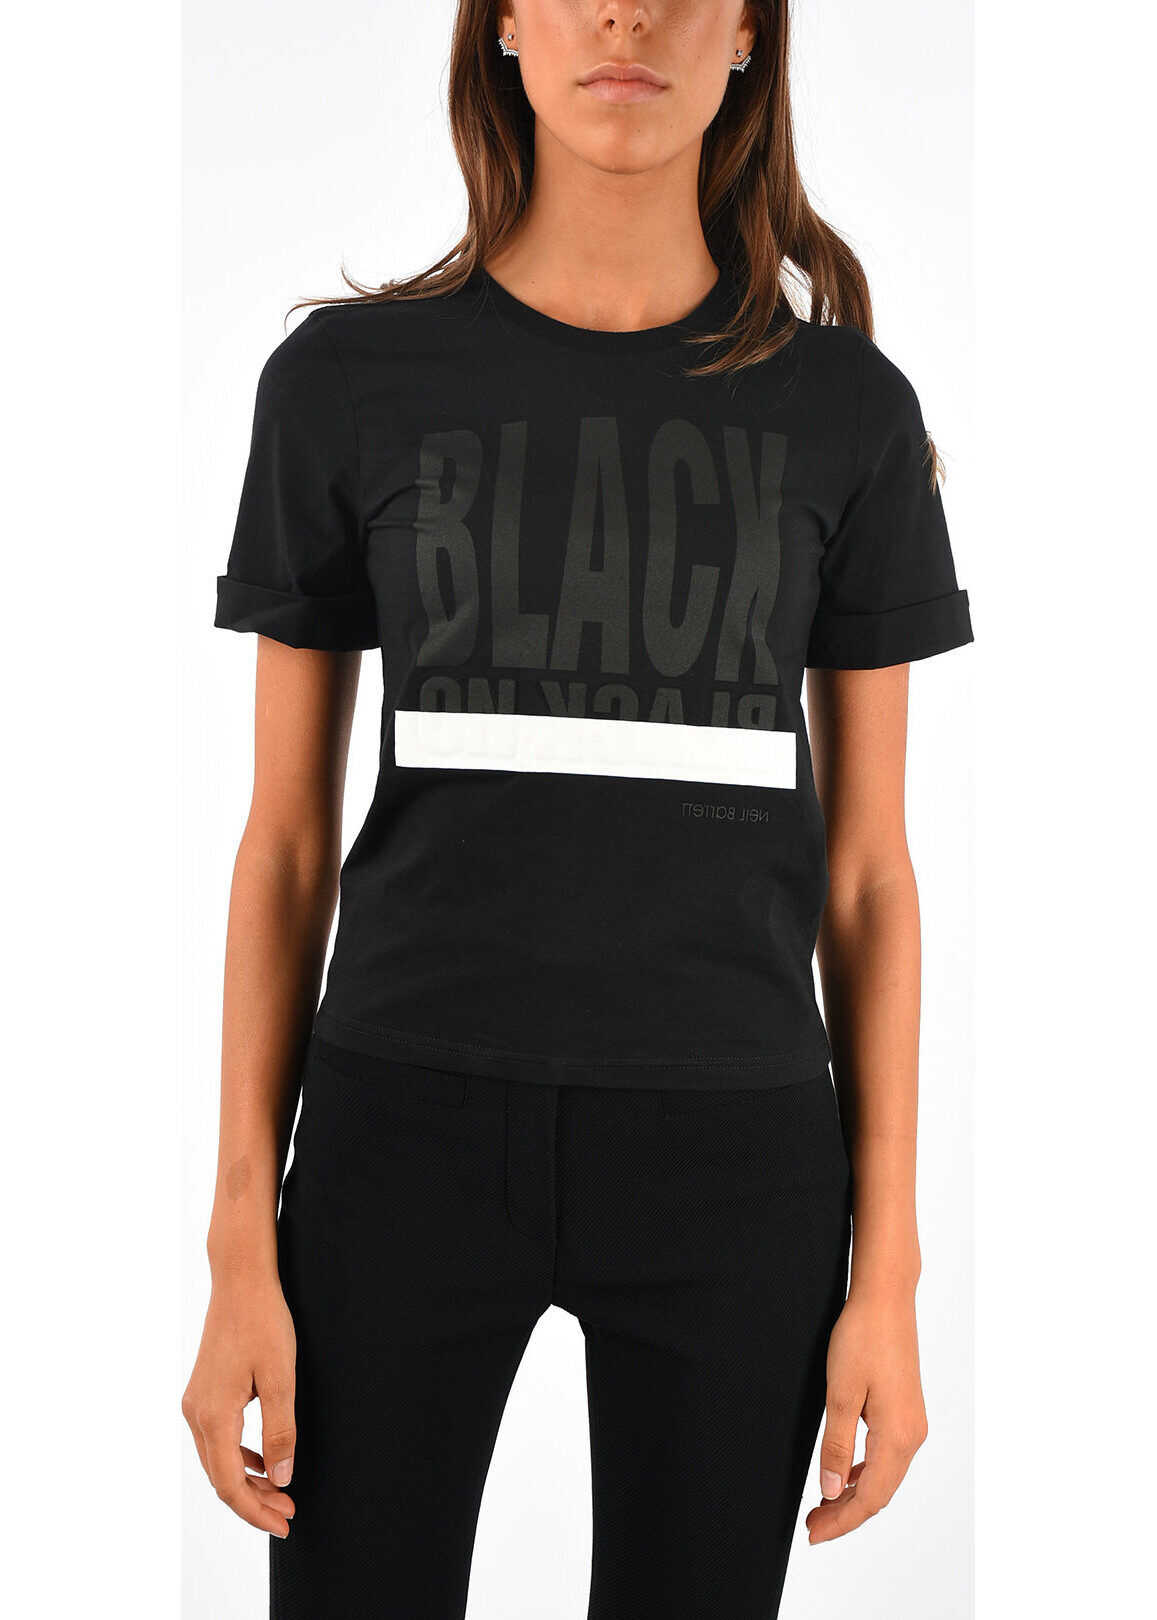 Neil Barrett BLACK ON BLACK Printed Crewneck T-shirt BLACK